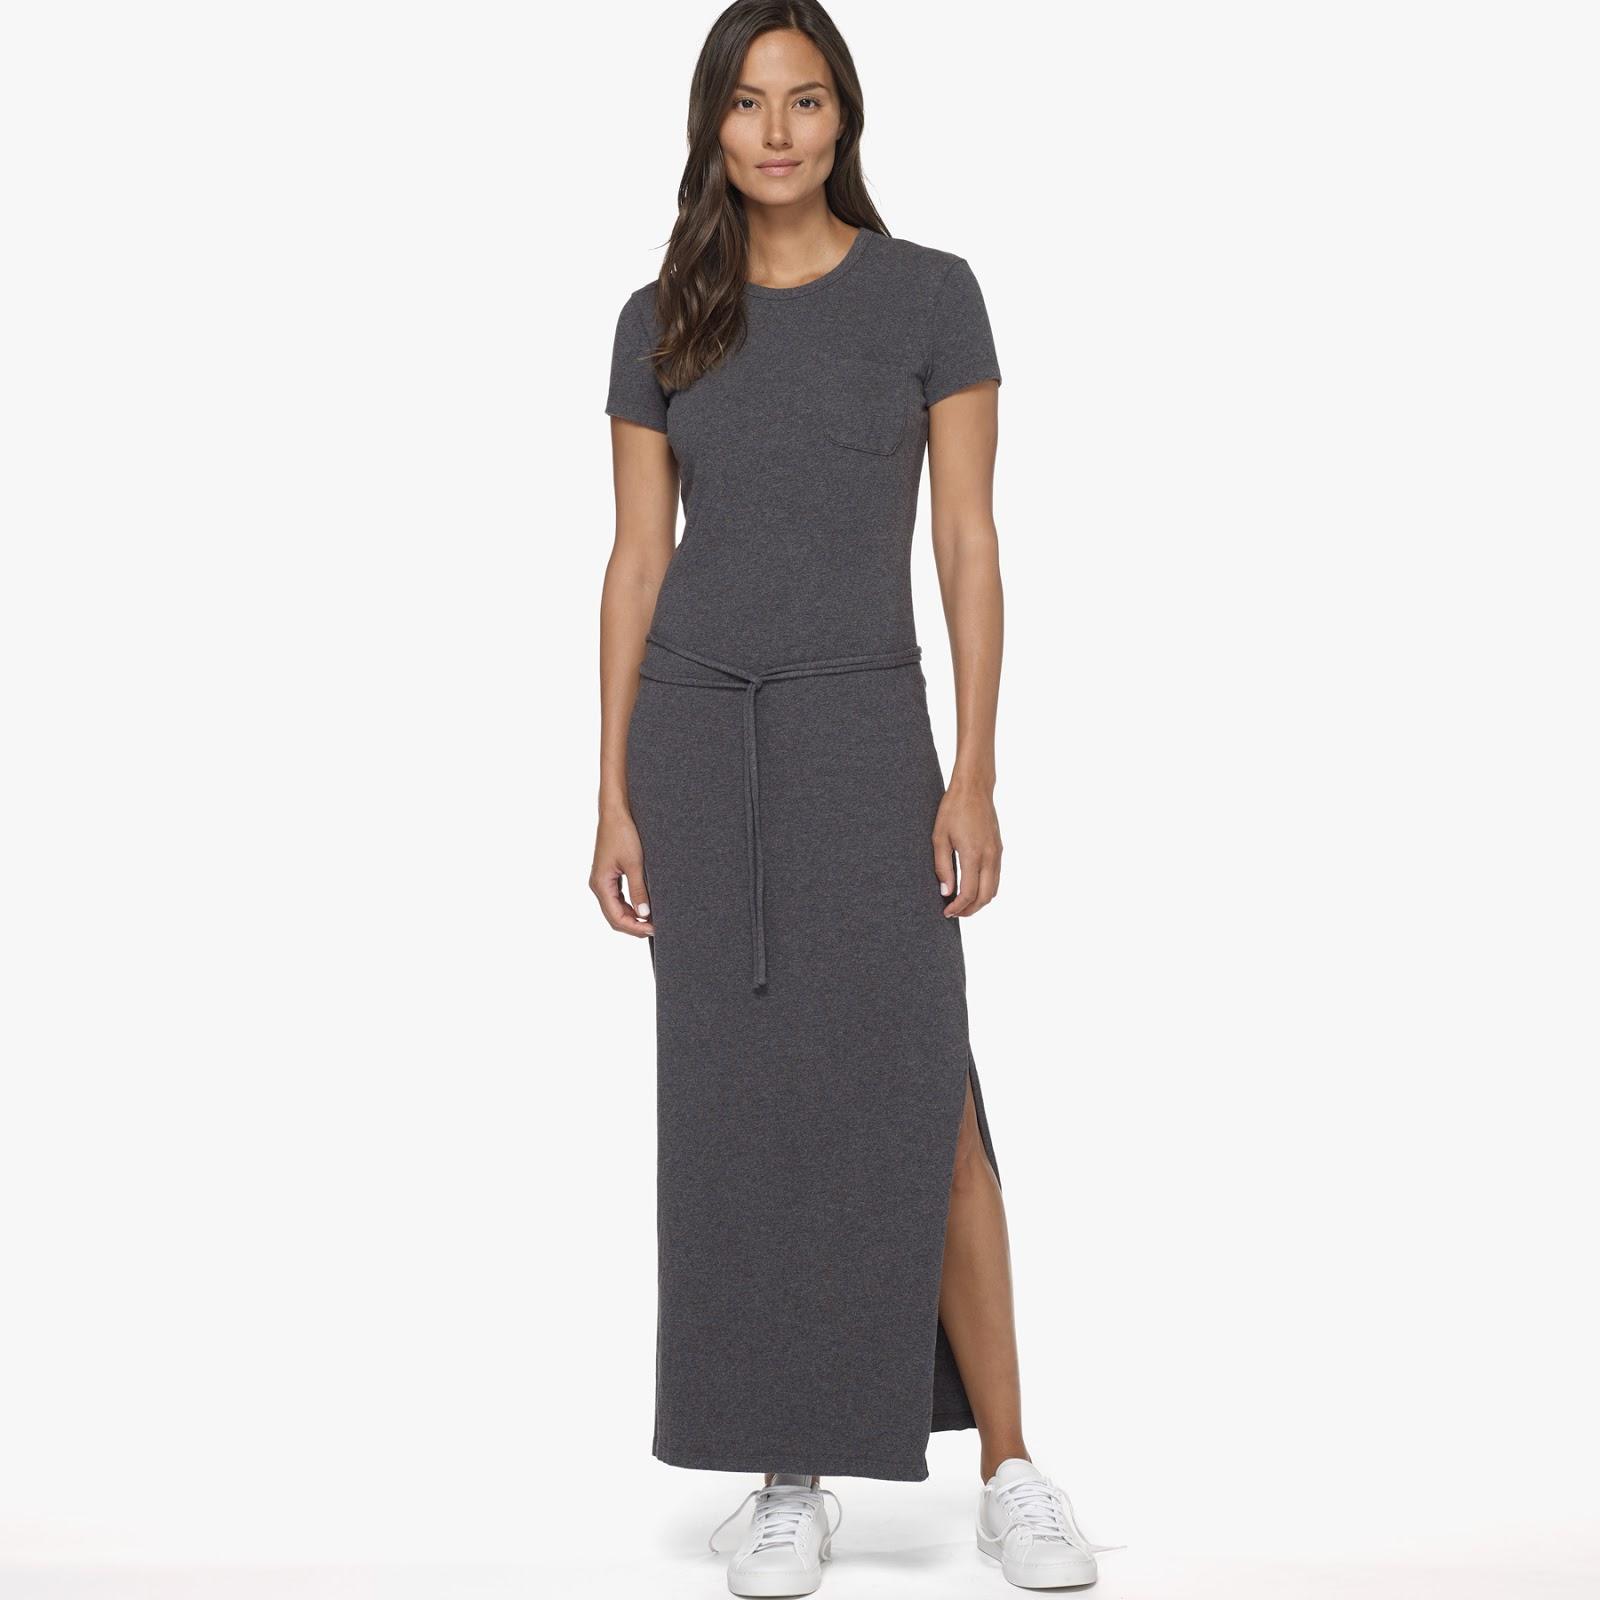 fashionably petite: James Perse Sample Sale - 5/24 - 5/29/16